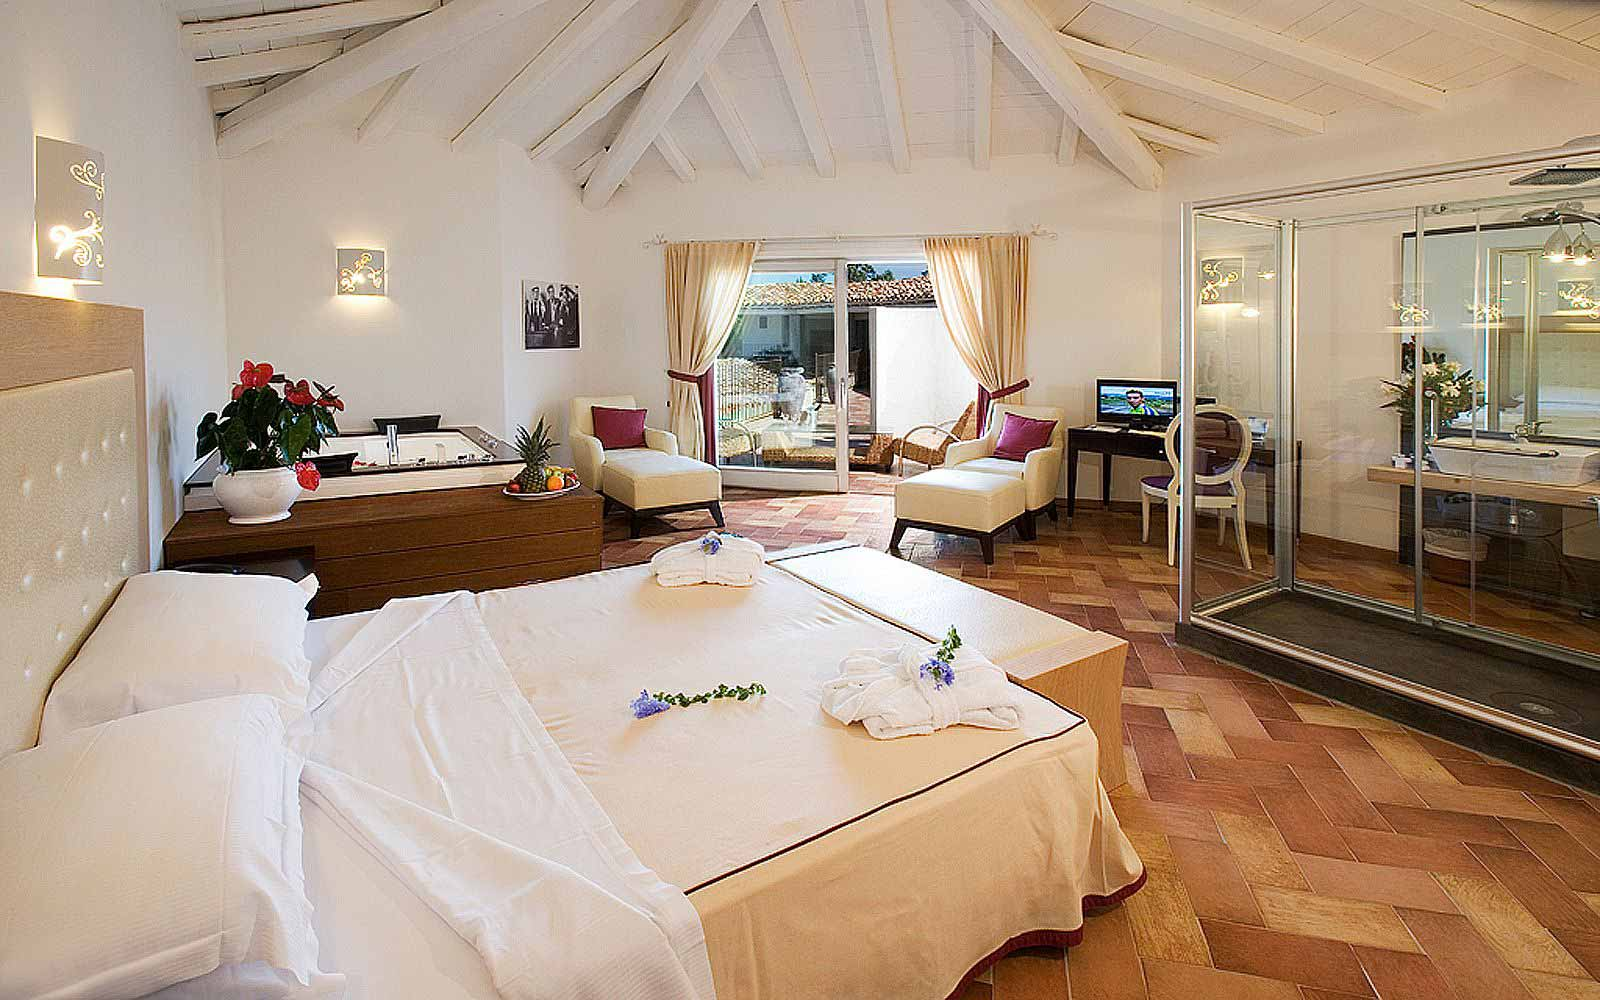 Royal Suite at Hotel Villas Resort